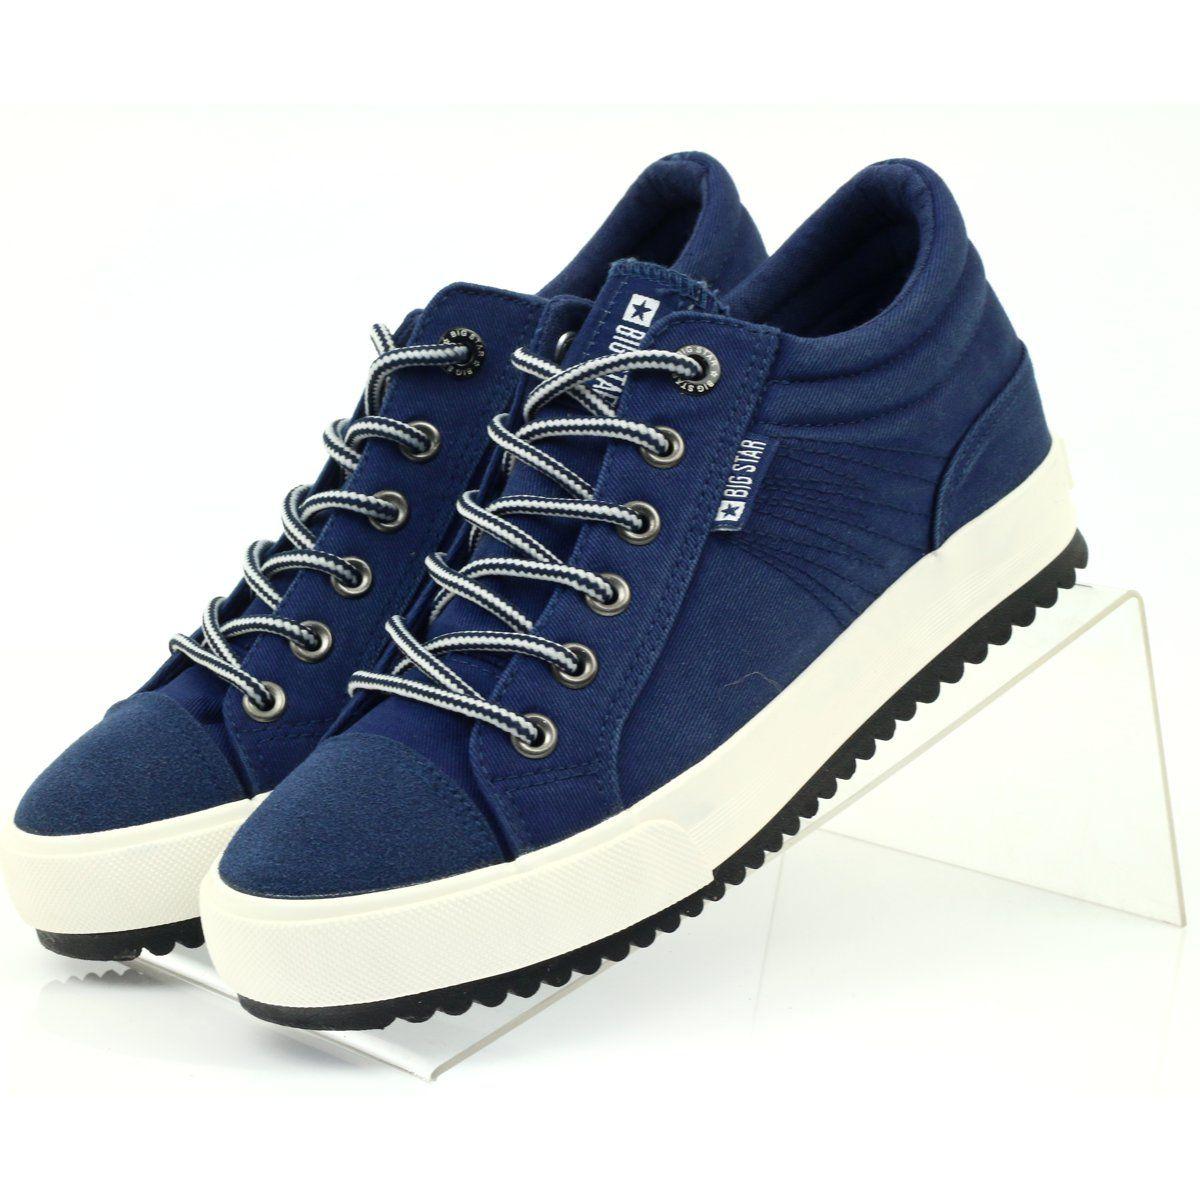 Trampki Na Koturnie Big Star 274502 Granatowe Star Sneakers Navy Blue Top Trainers Women